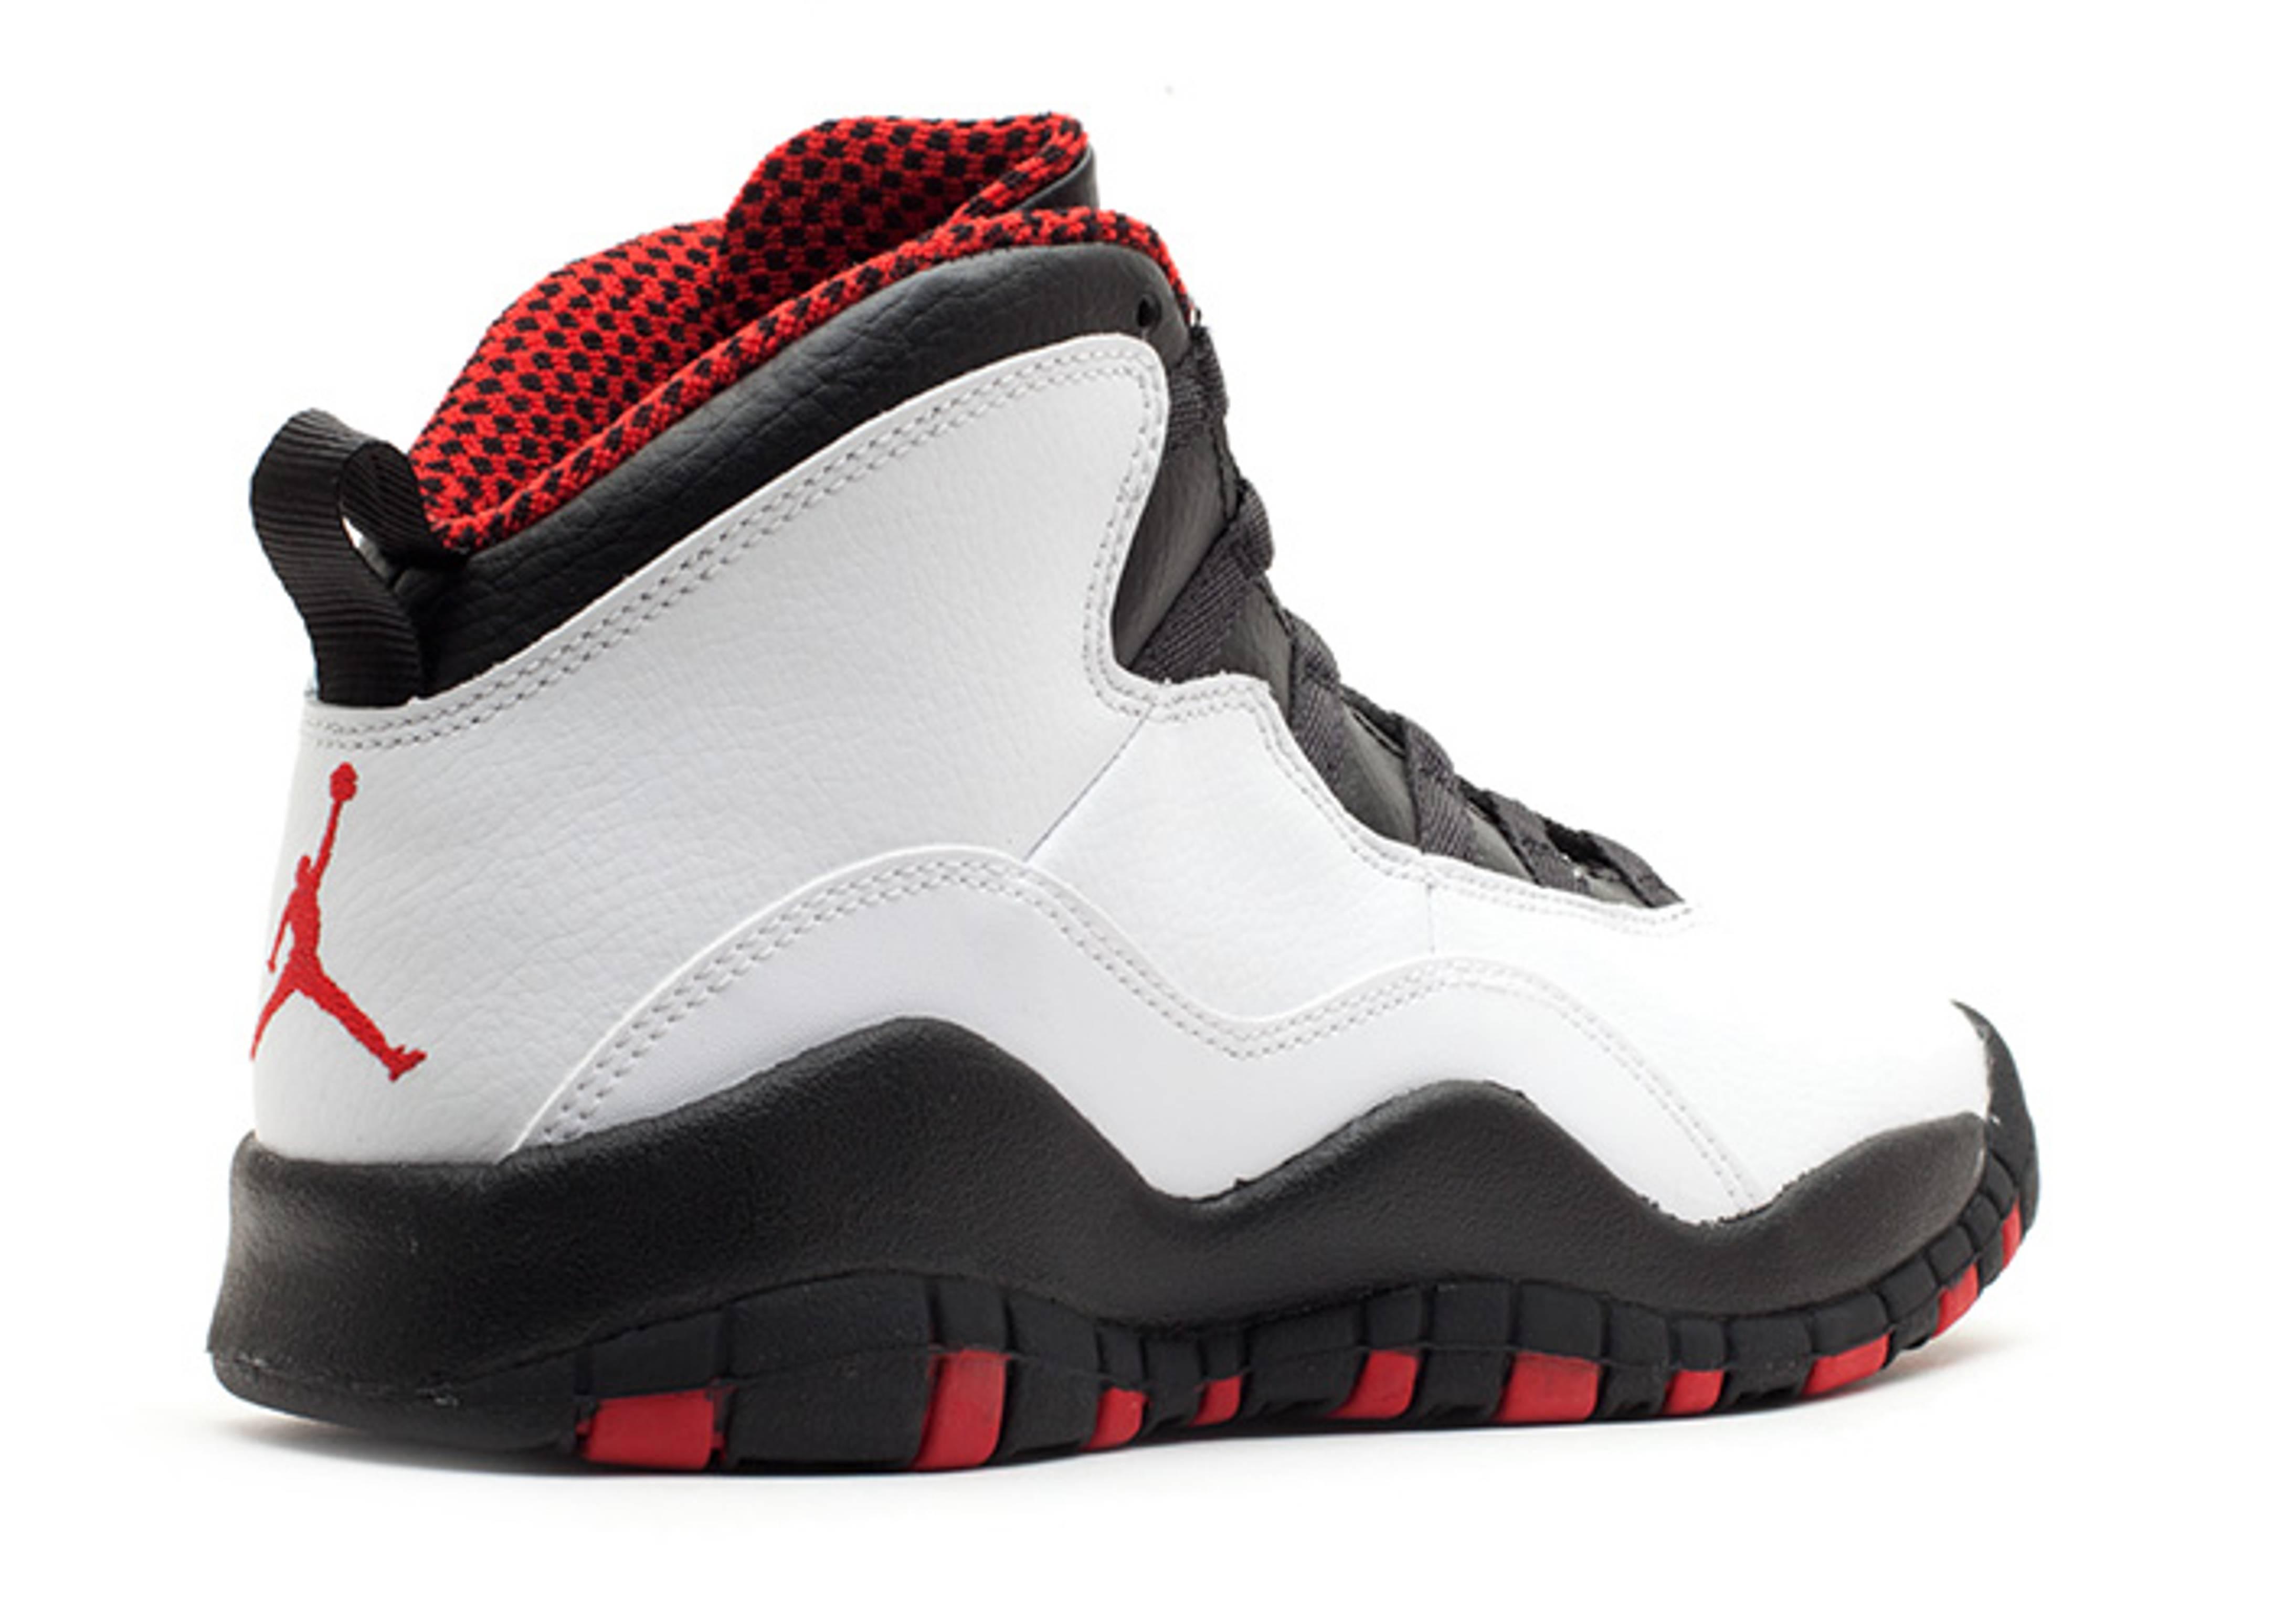 NIKE AIR JORDAN 10 X RETRO GS BG CHICAGO 310806-100 WHITE RED BLACK doble nickel